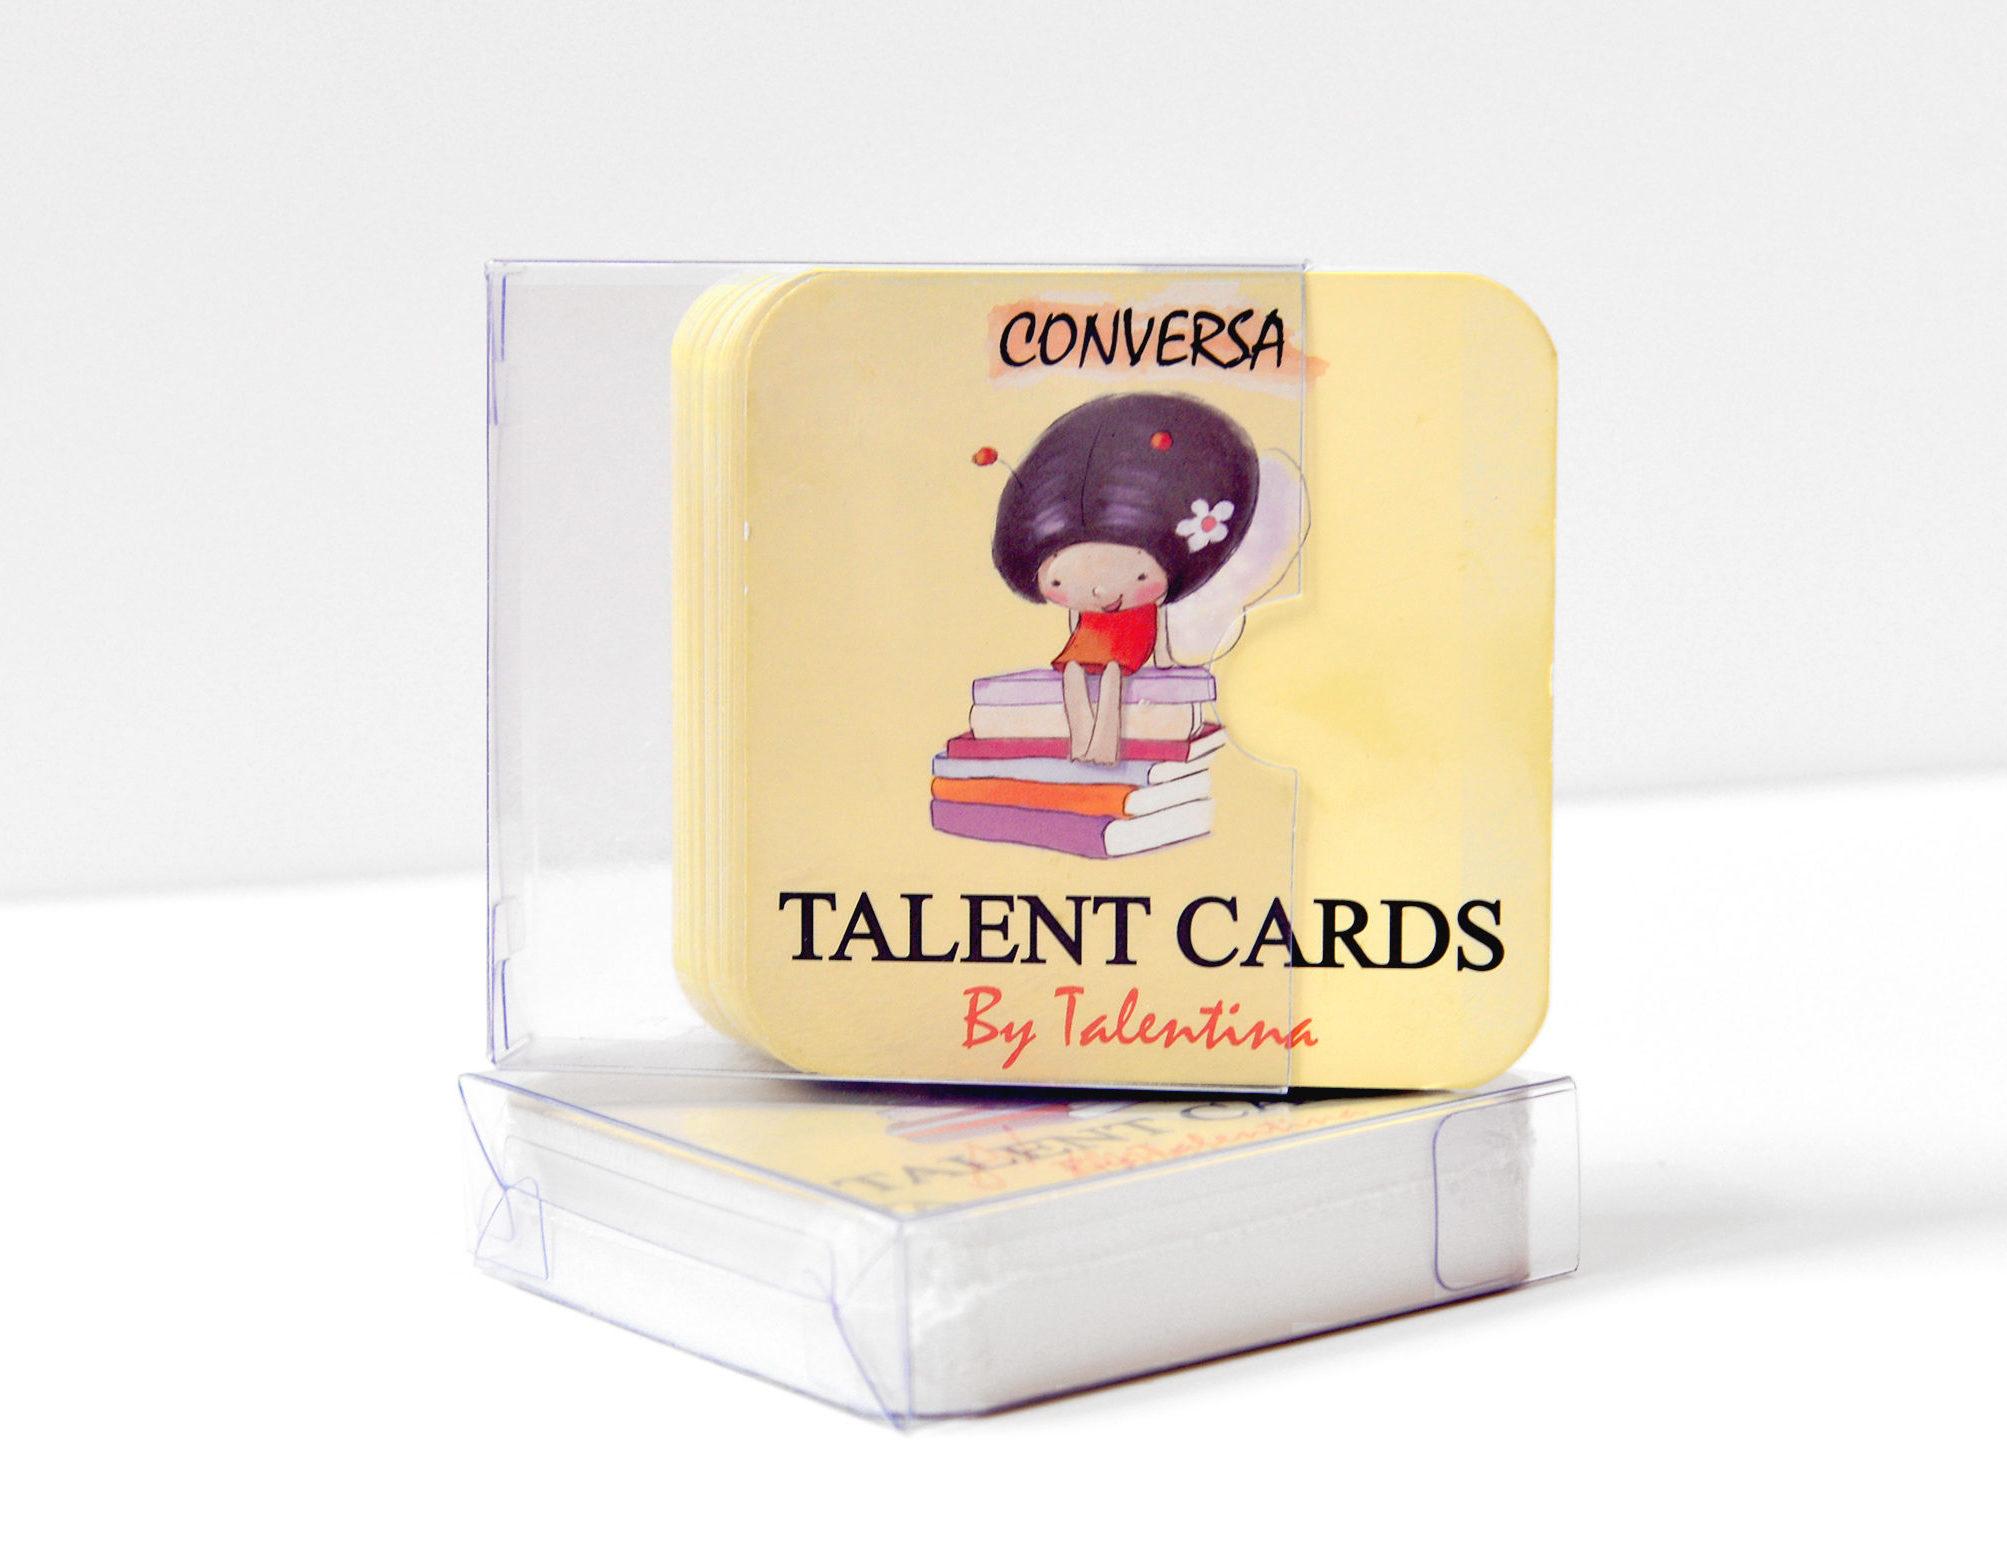 Talent Cards Conversa